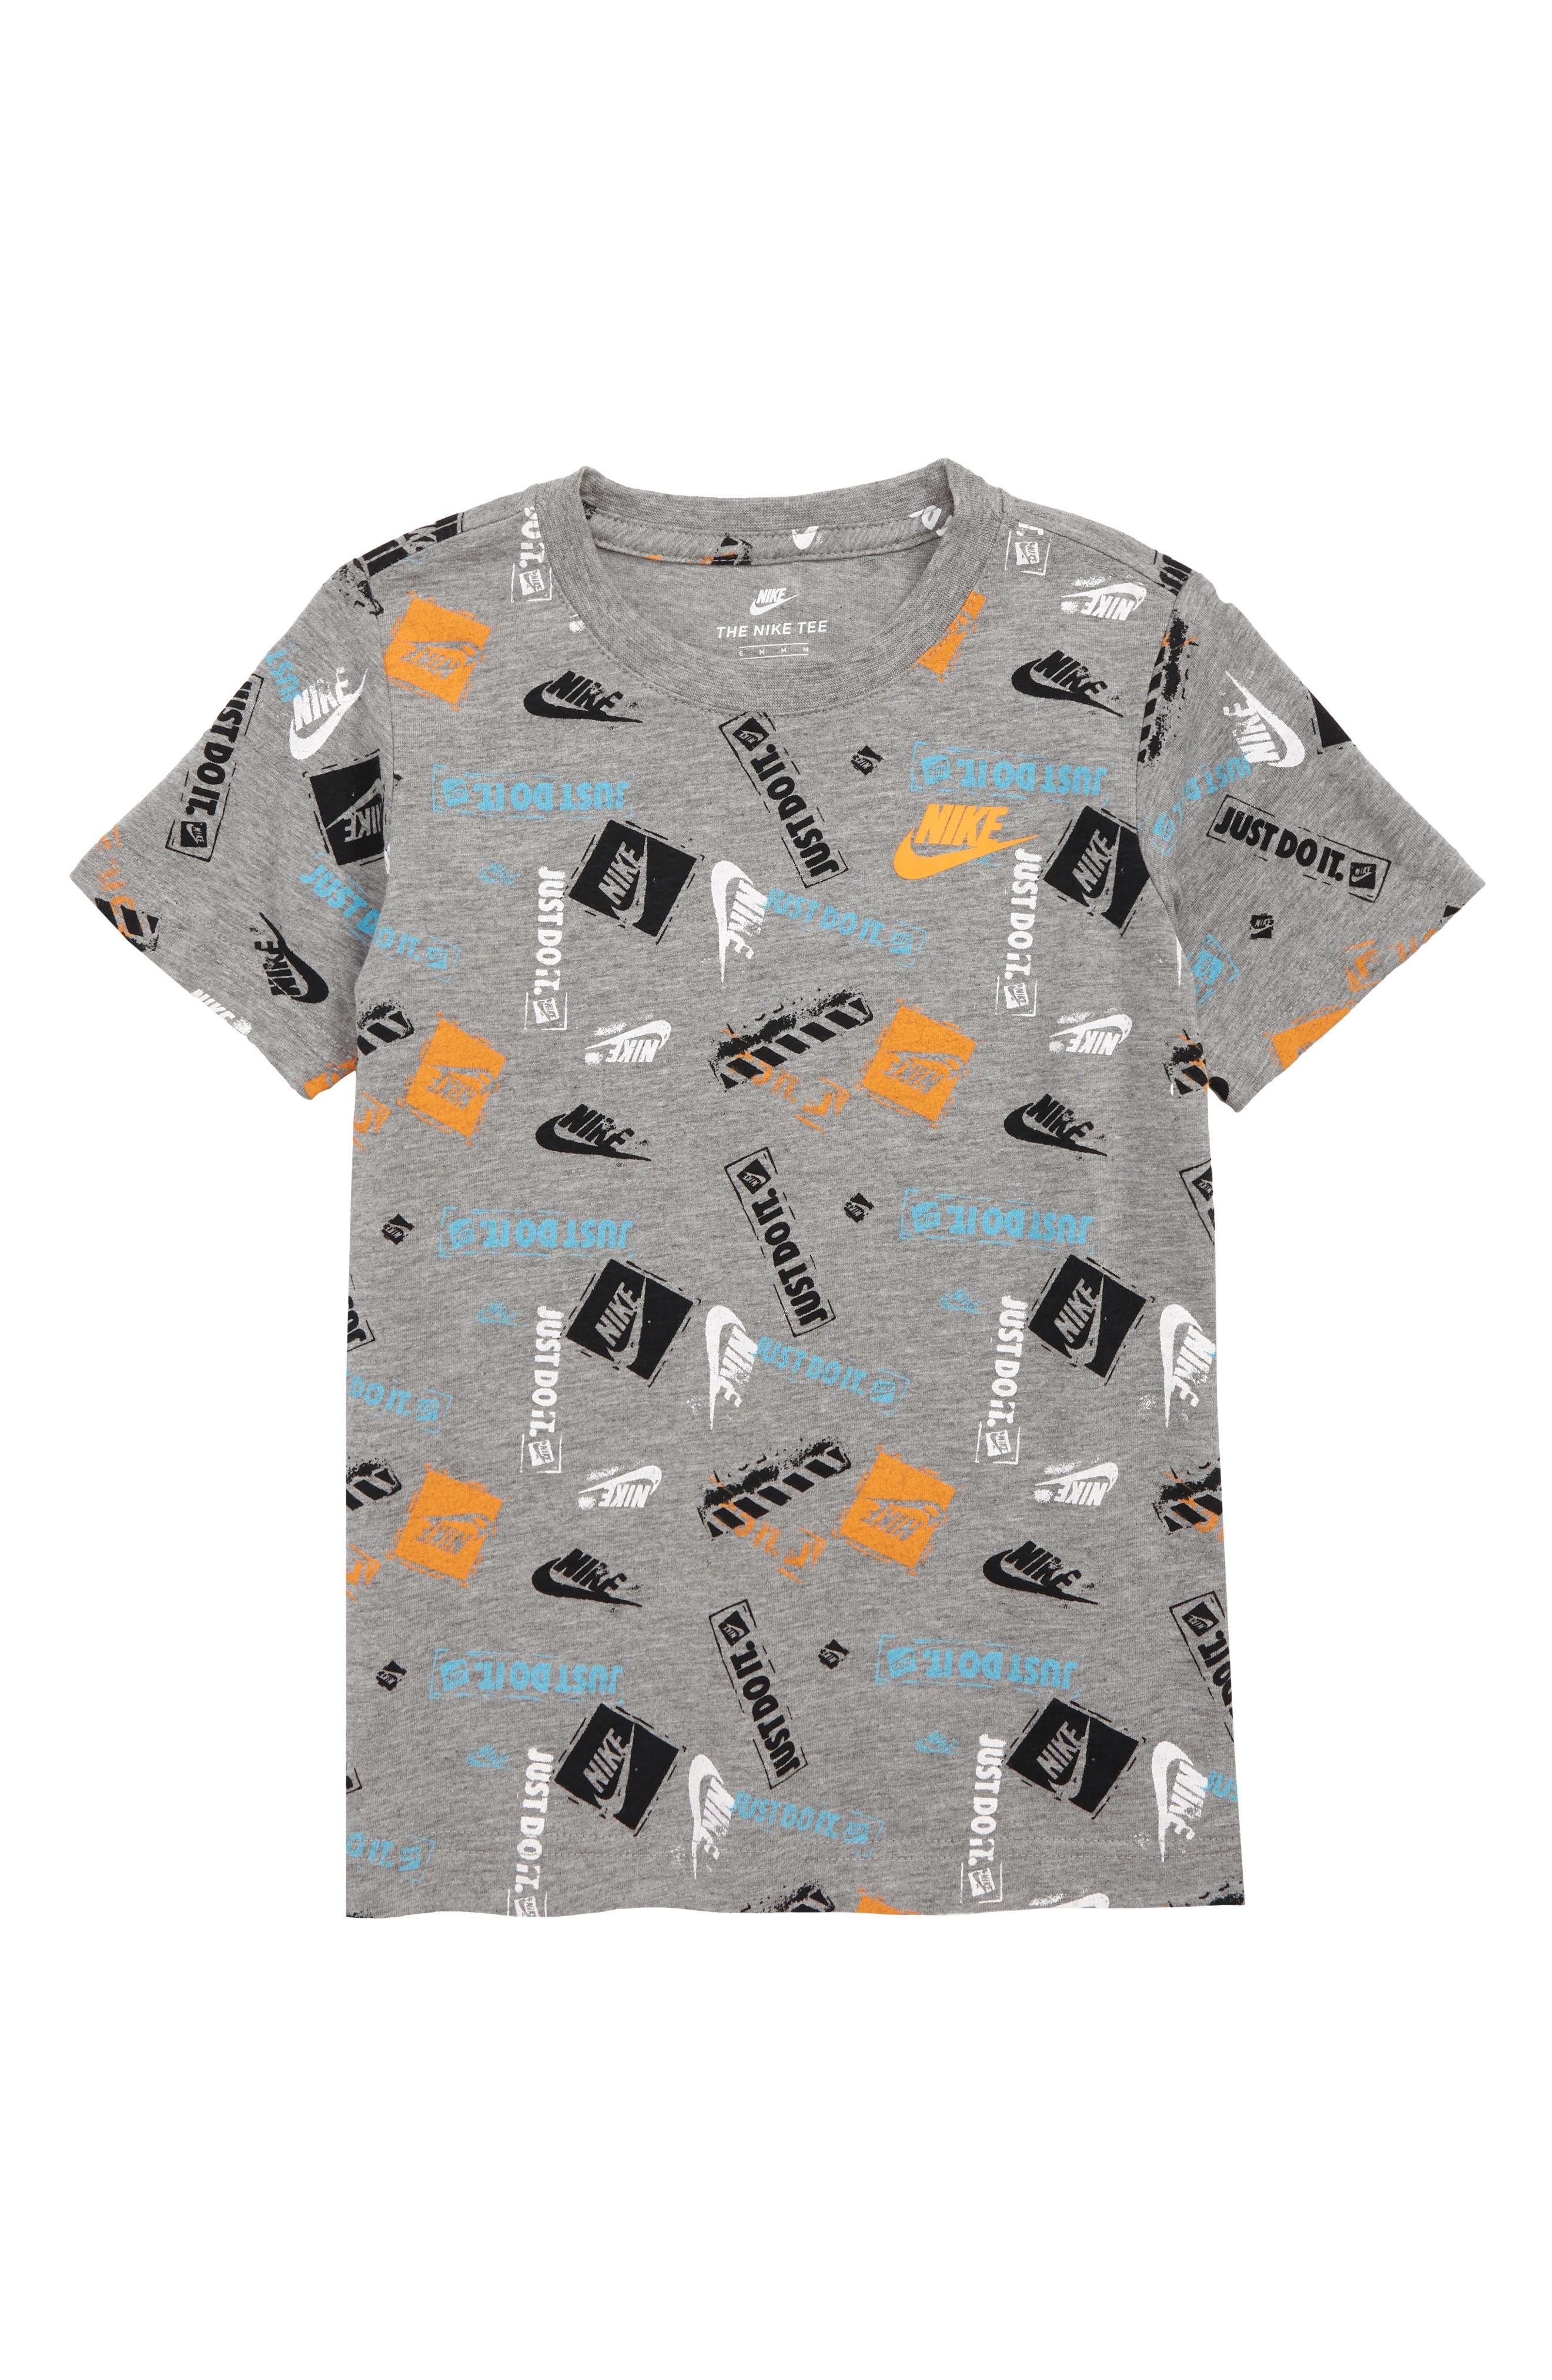 Boys Nike Logo Stamp TShirt Size 7  Grey